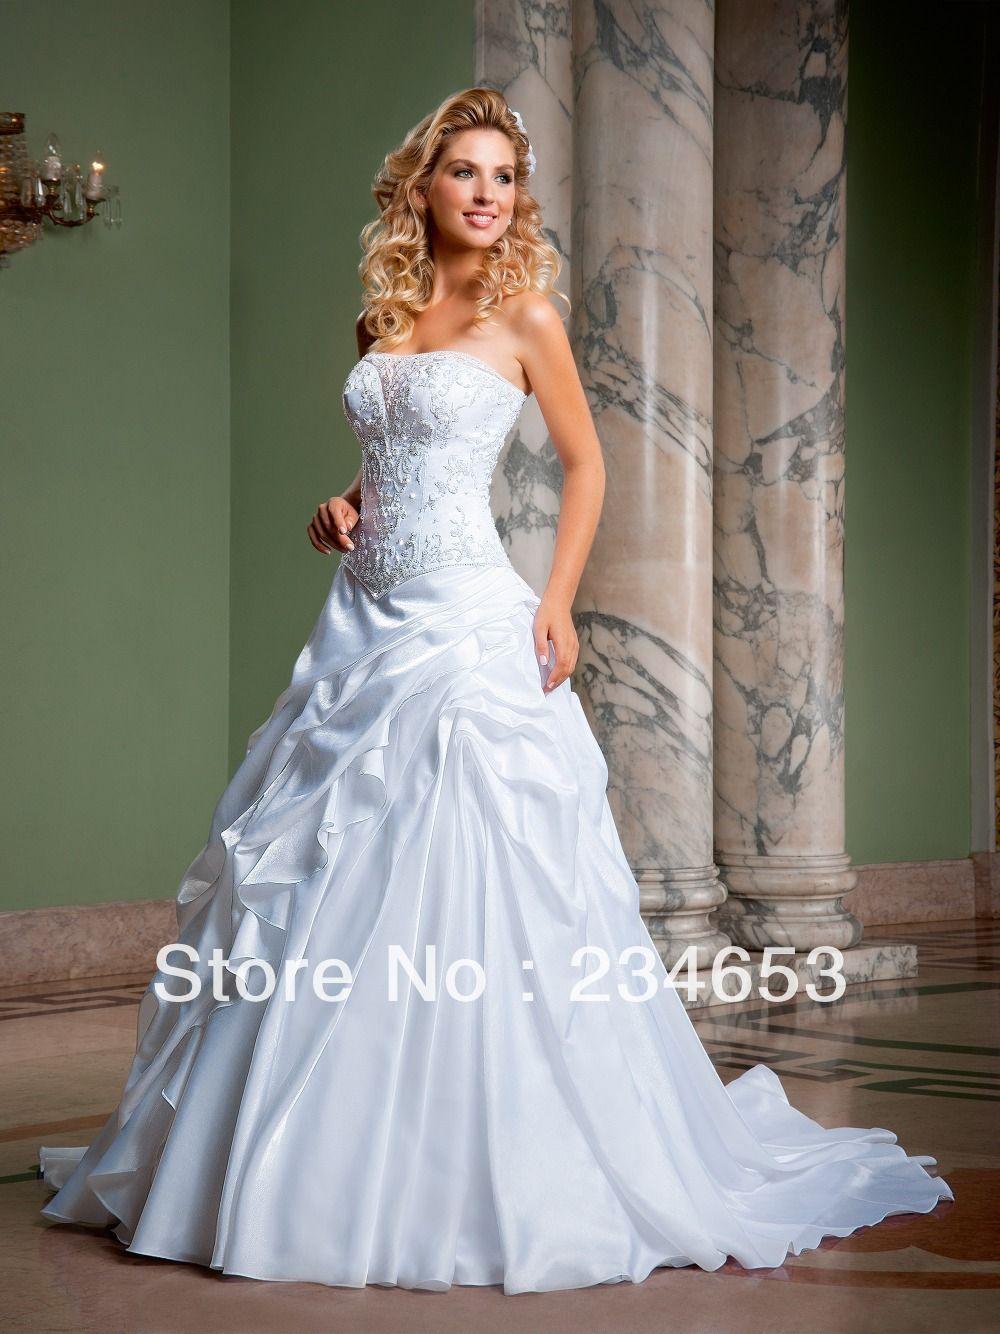 Vestido de de noiva 2014 strapless una línea de satén de novia ...